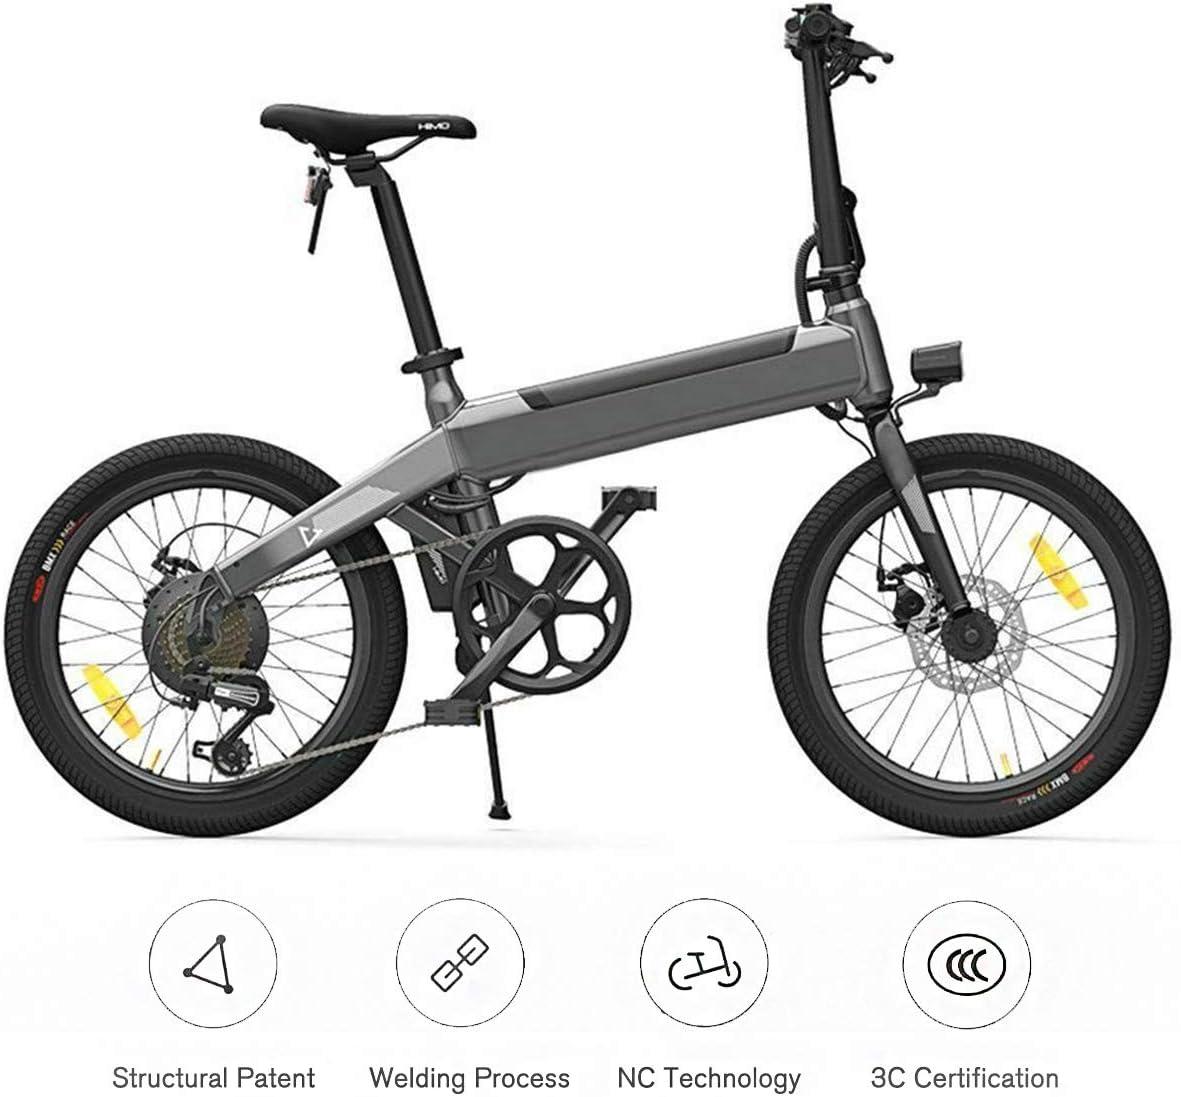 Fy-Light Bicicleta Eléctrica - Ligera Plegable 20 E-Bike Mountain Sport con Batería de Litio 36V 10Ah 6 Velocidades para Adultos: Amazon.es: Deportes y aire libre